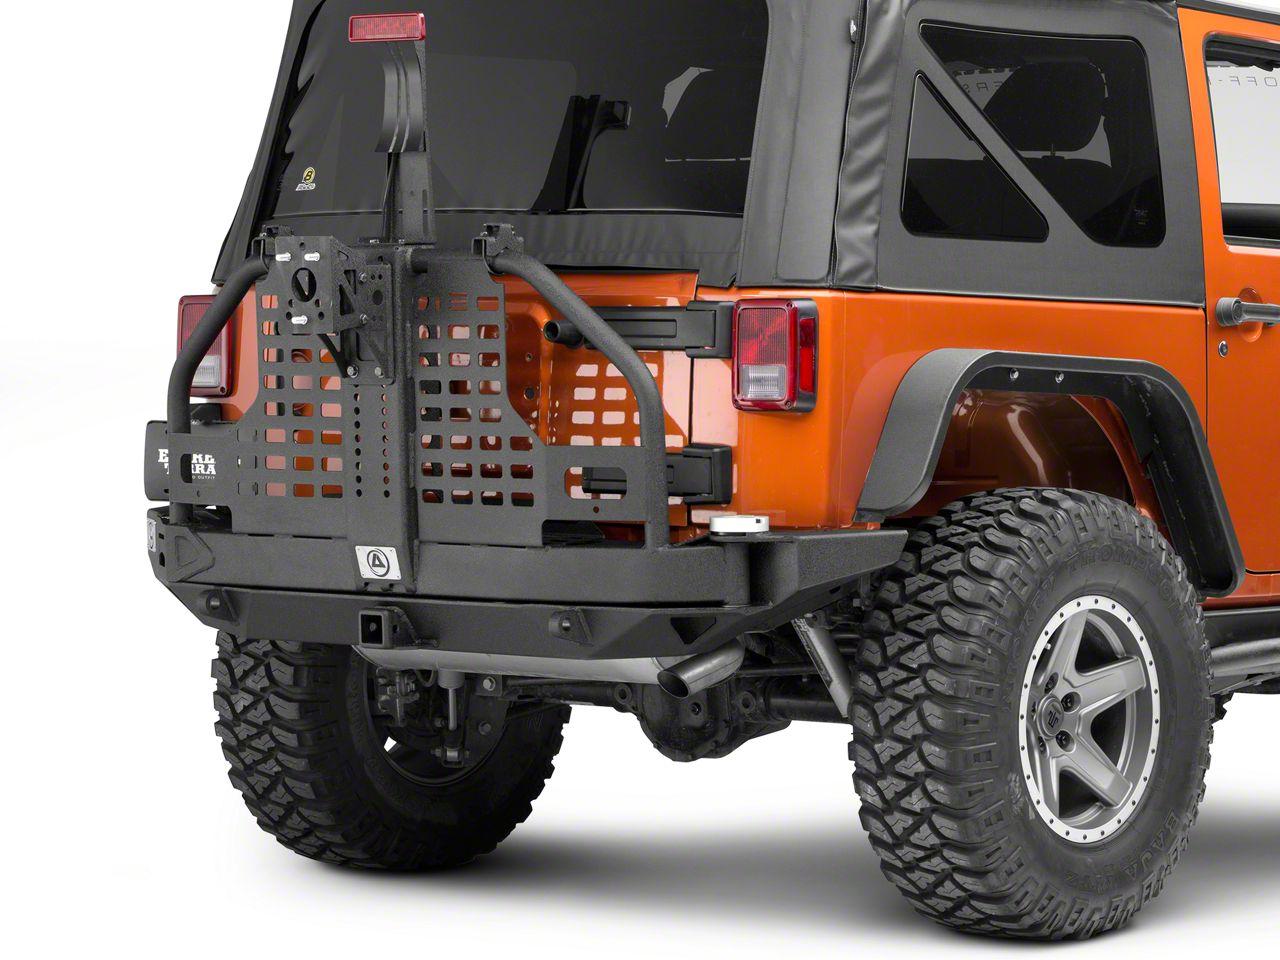 Smittybilt XRC Atlas Rear Bumper w/ Tire Carrier (07-18 Jeep Wrangler JK)